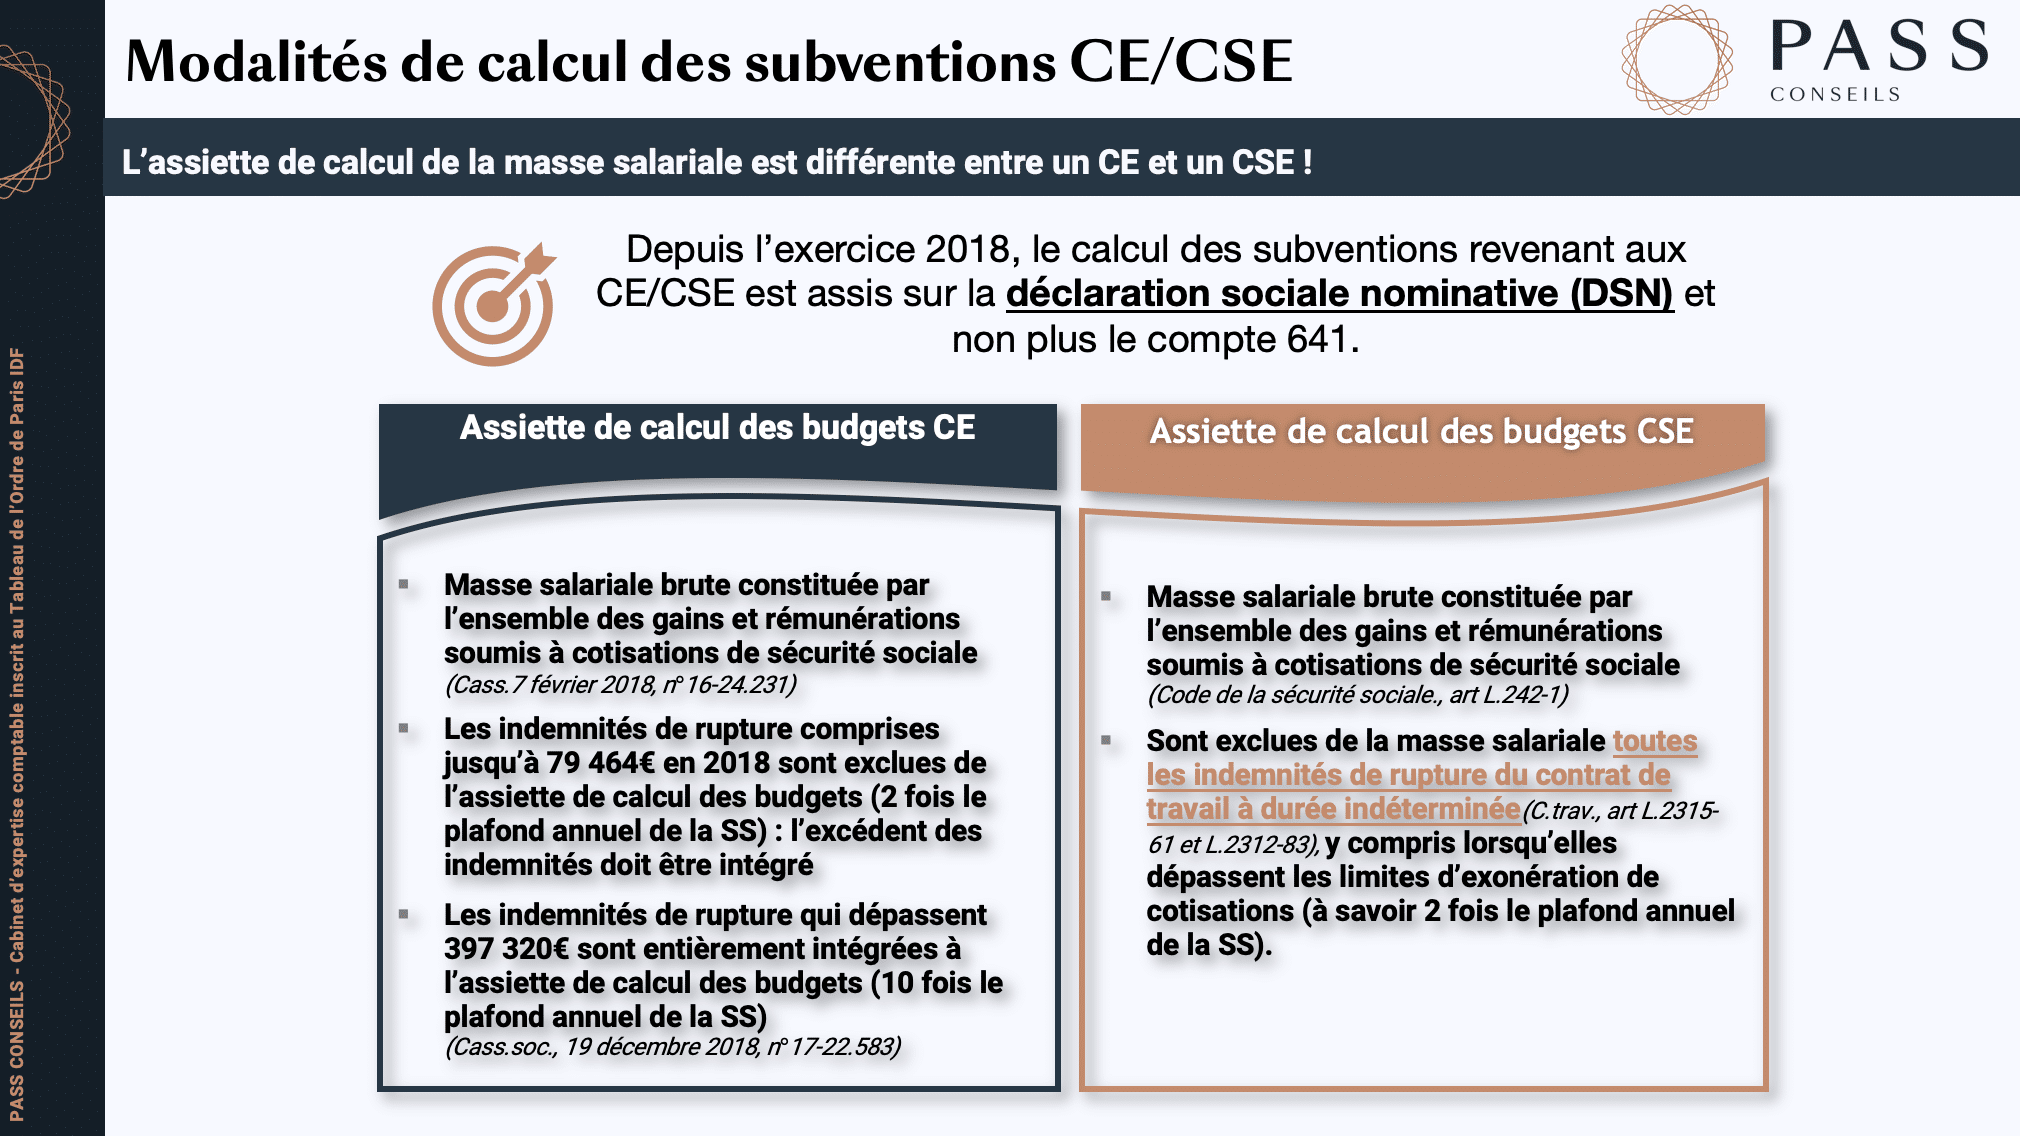 modalites calcul subventions CE/CSE